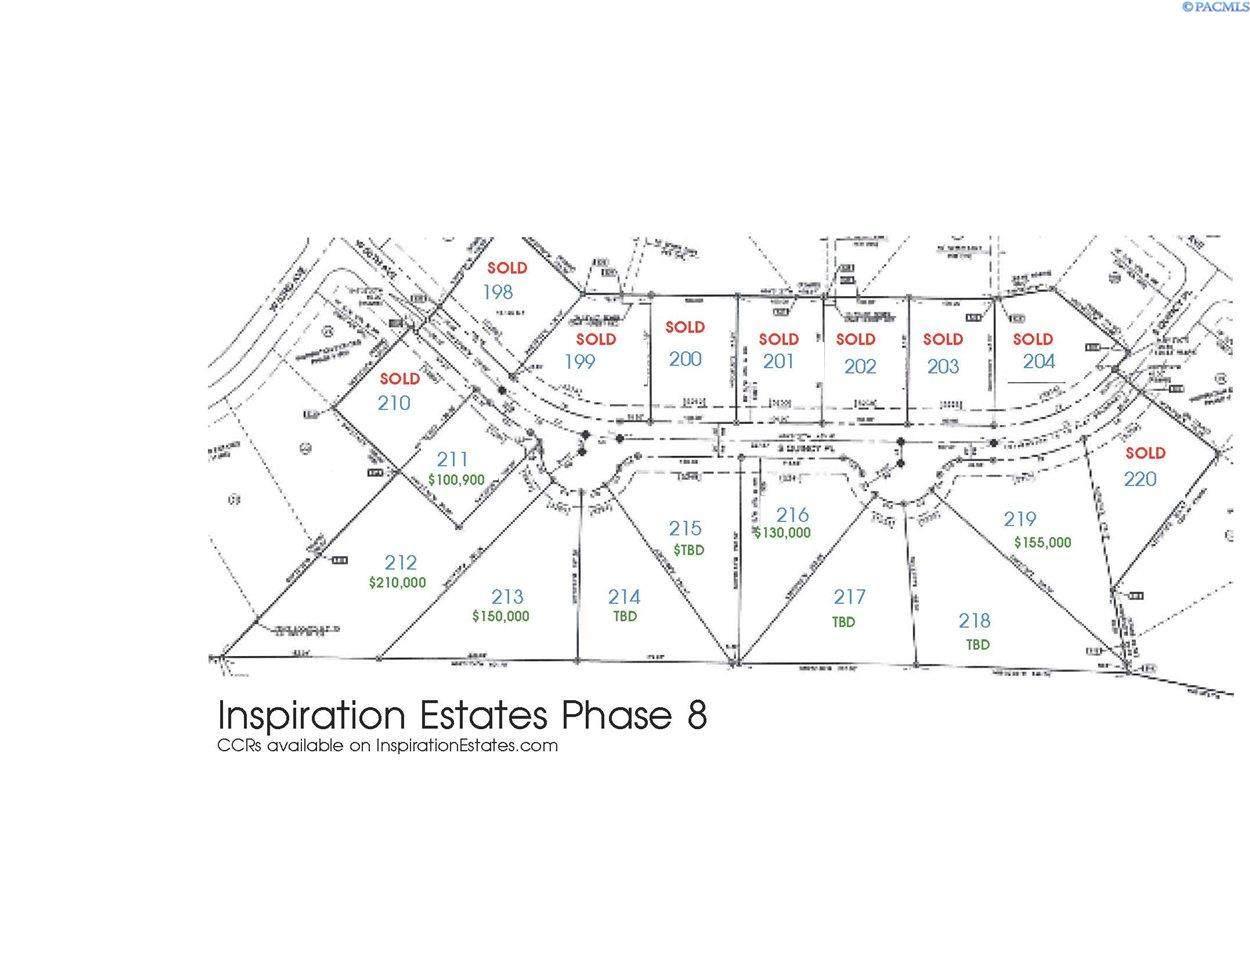 IE LOT 218 Phase Viii - Photo 1